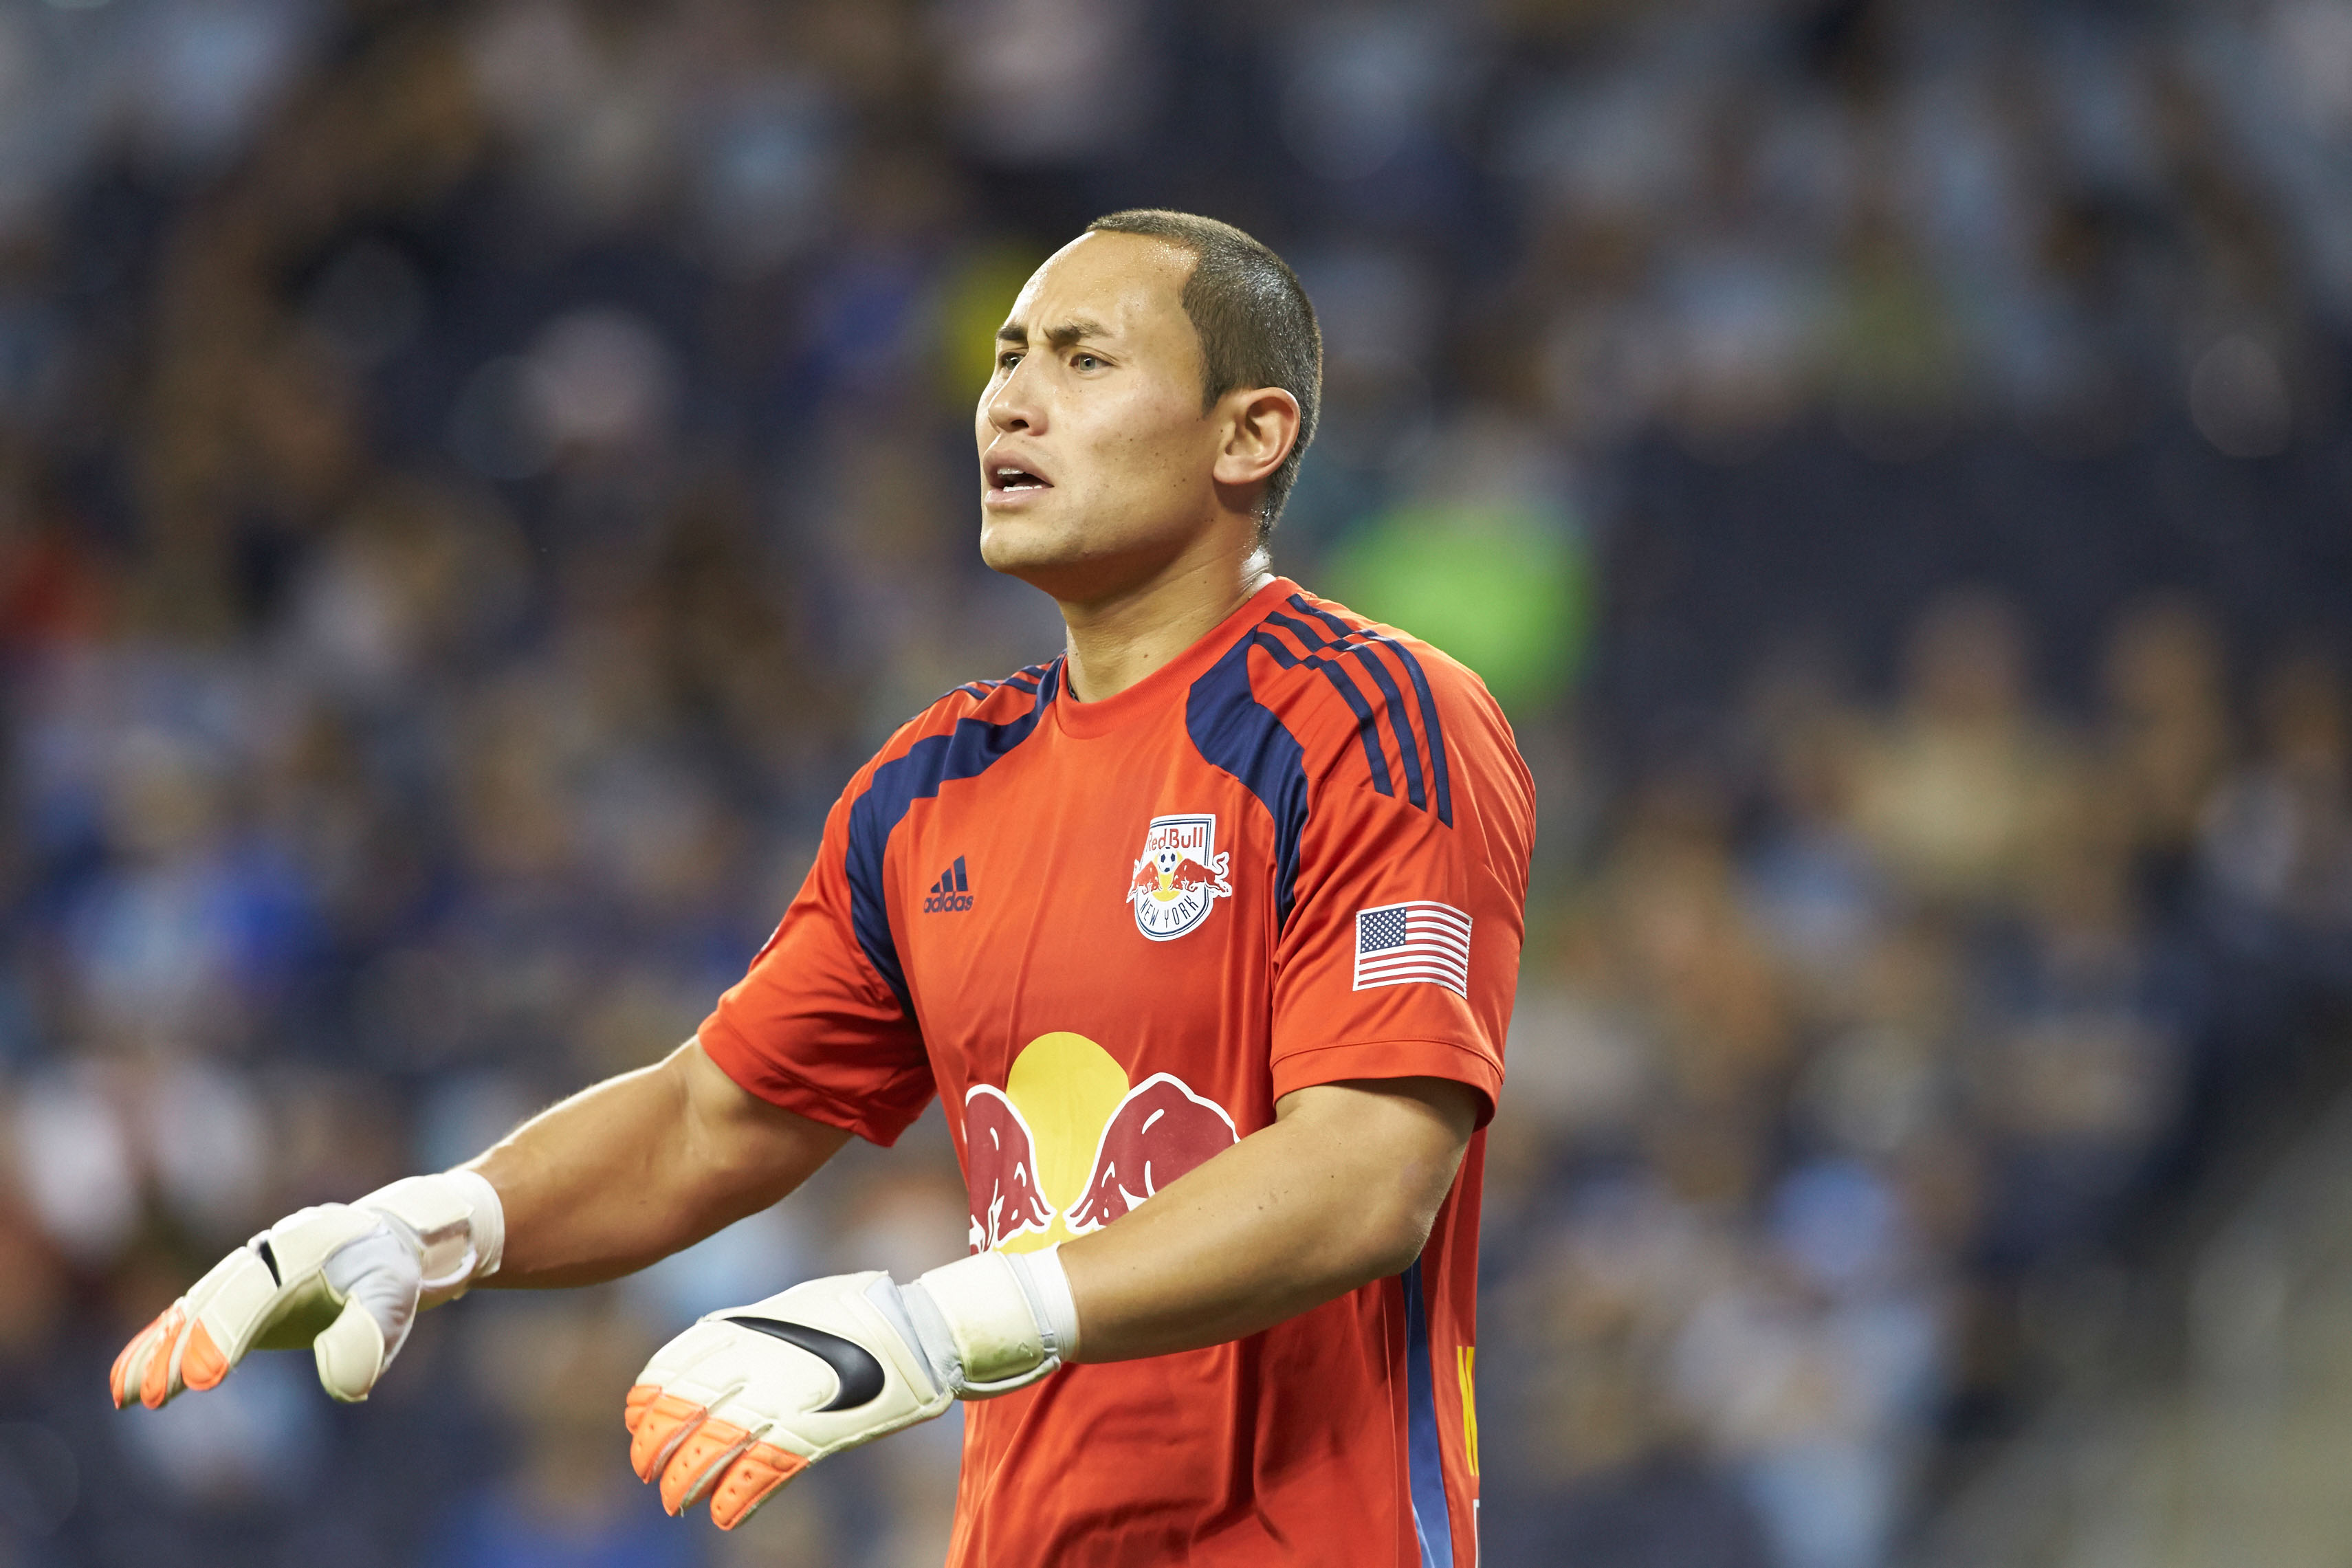 Photo by Gary Rohman/MLS/USA TODAY Sports